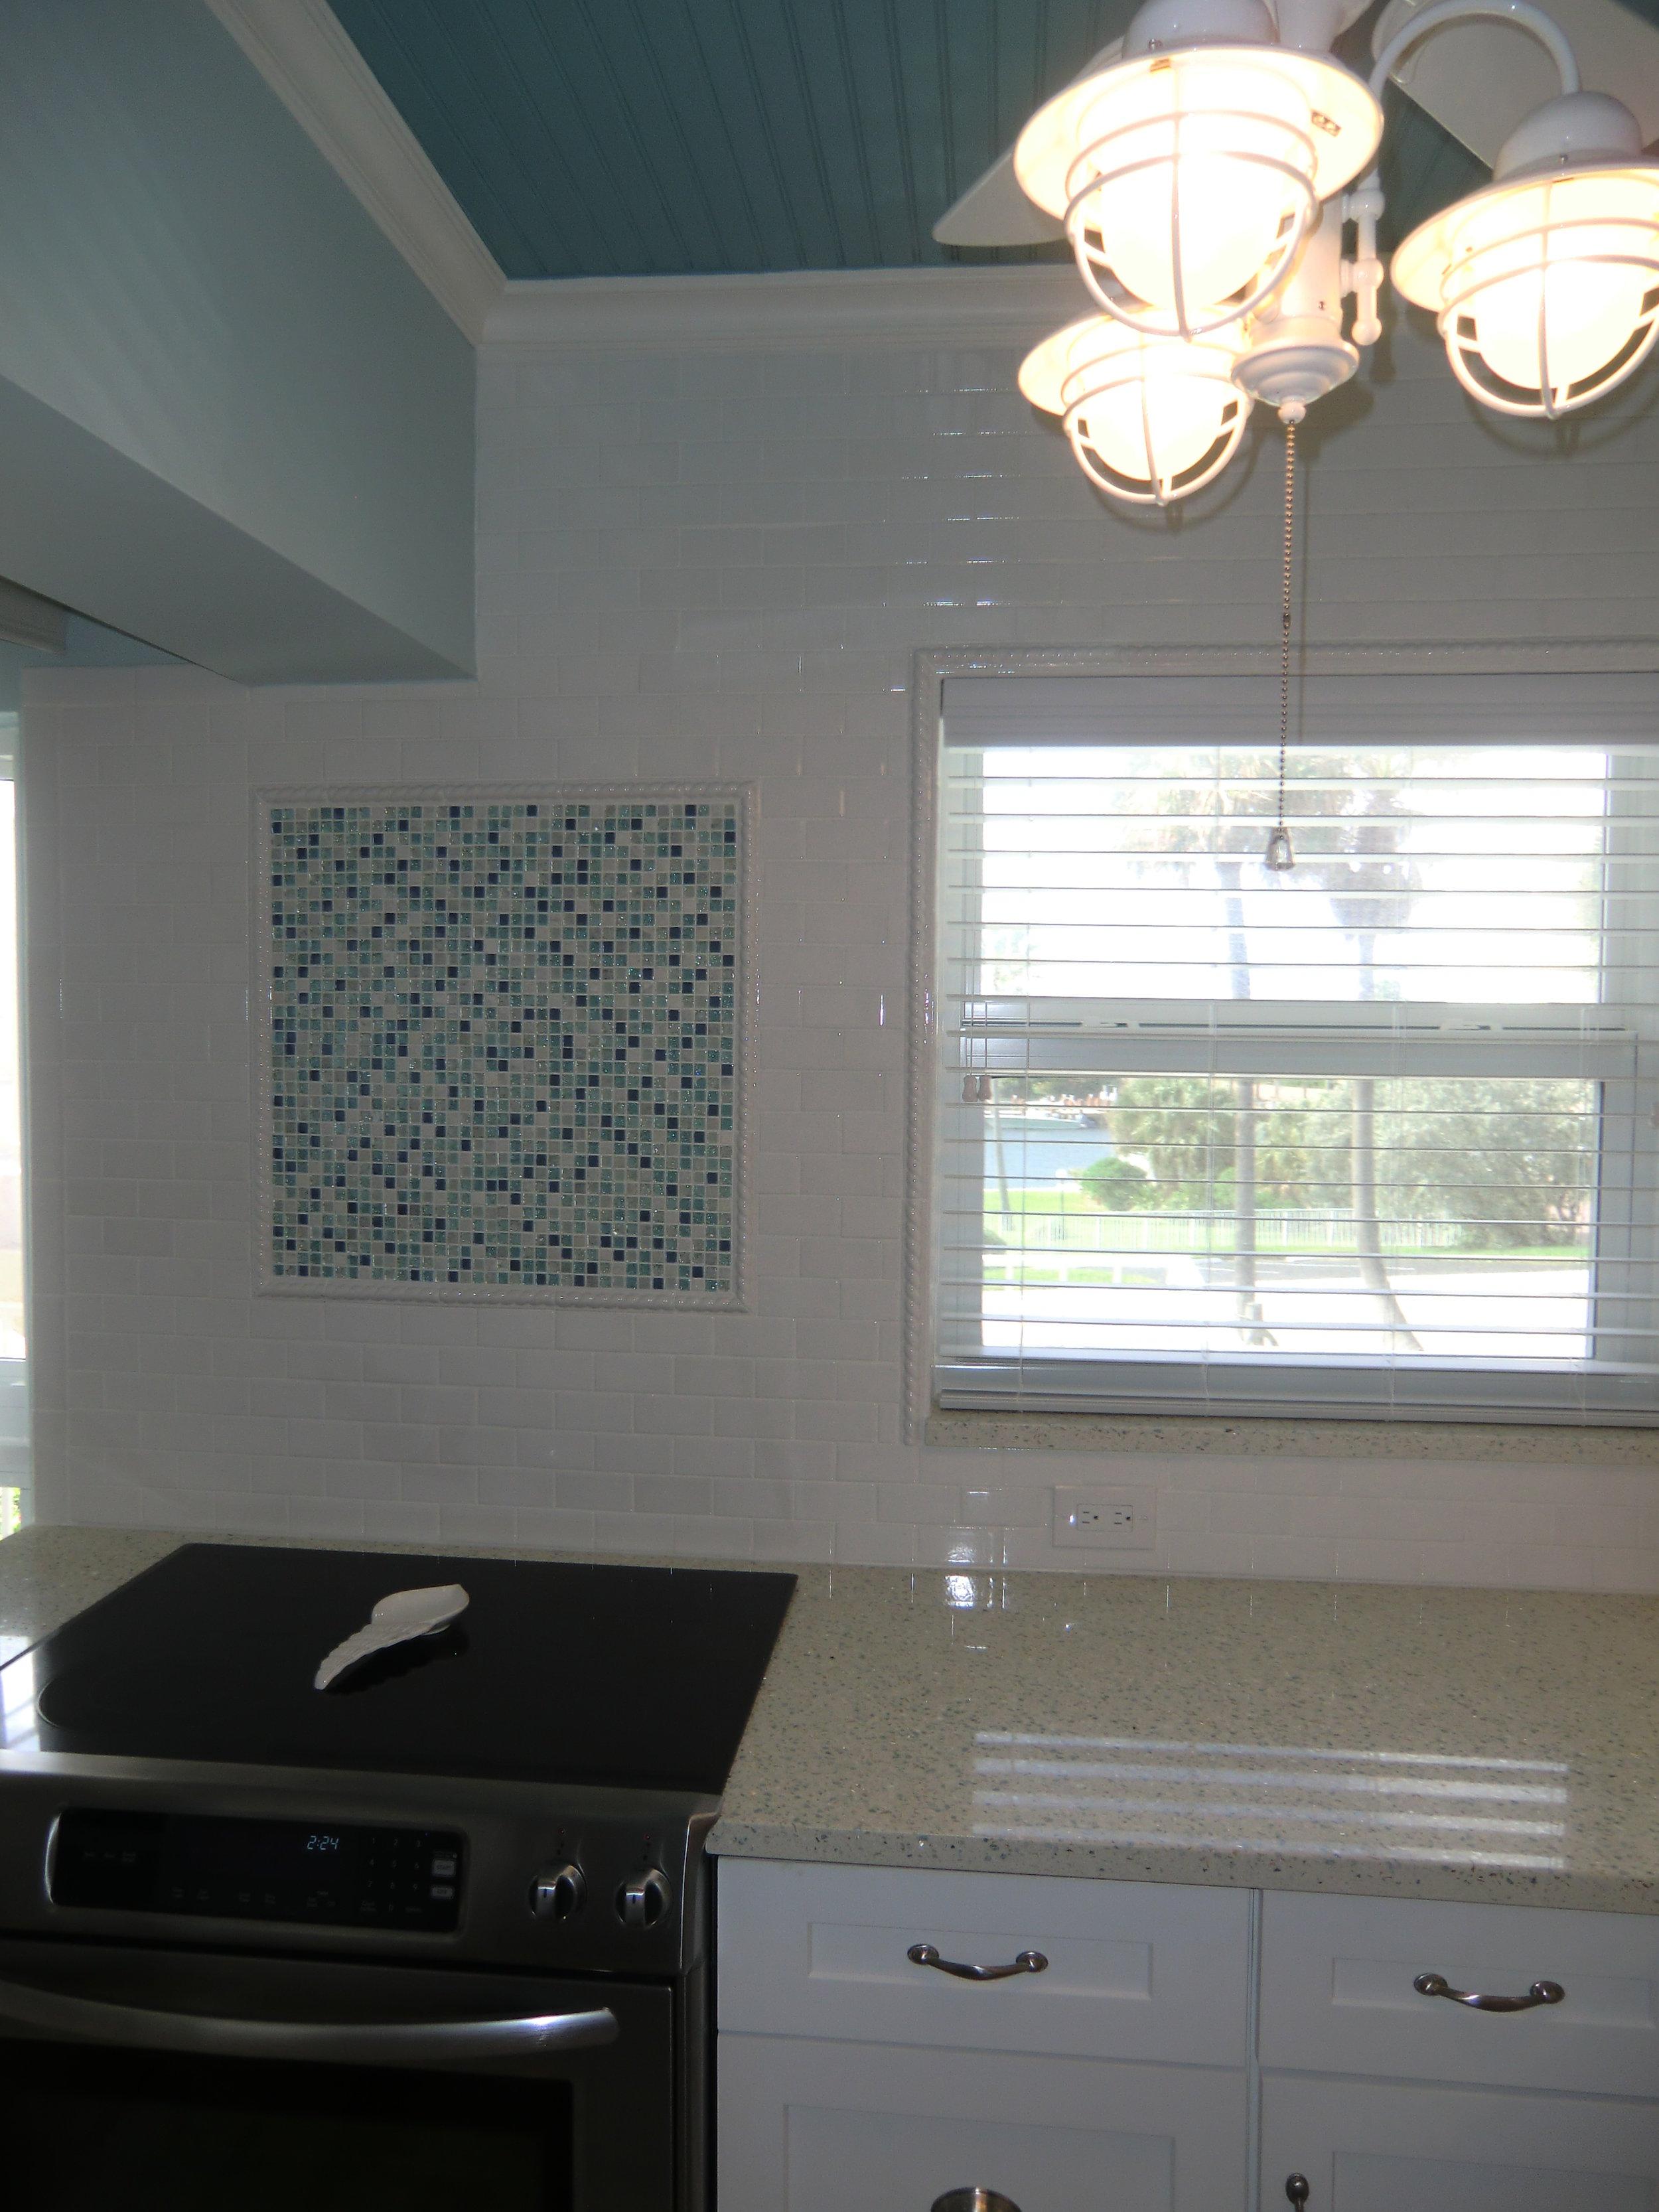 Beach-kitchen-remodel-tile-wall-blue-ceiling.JPG